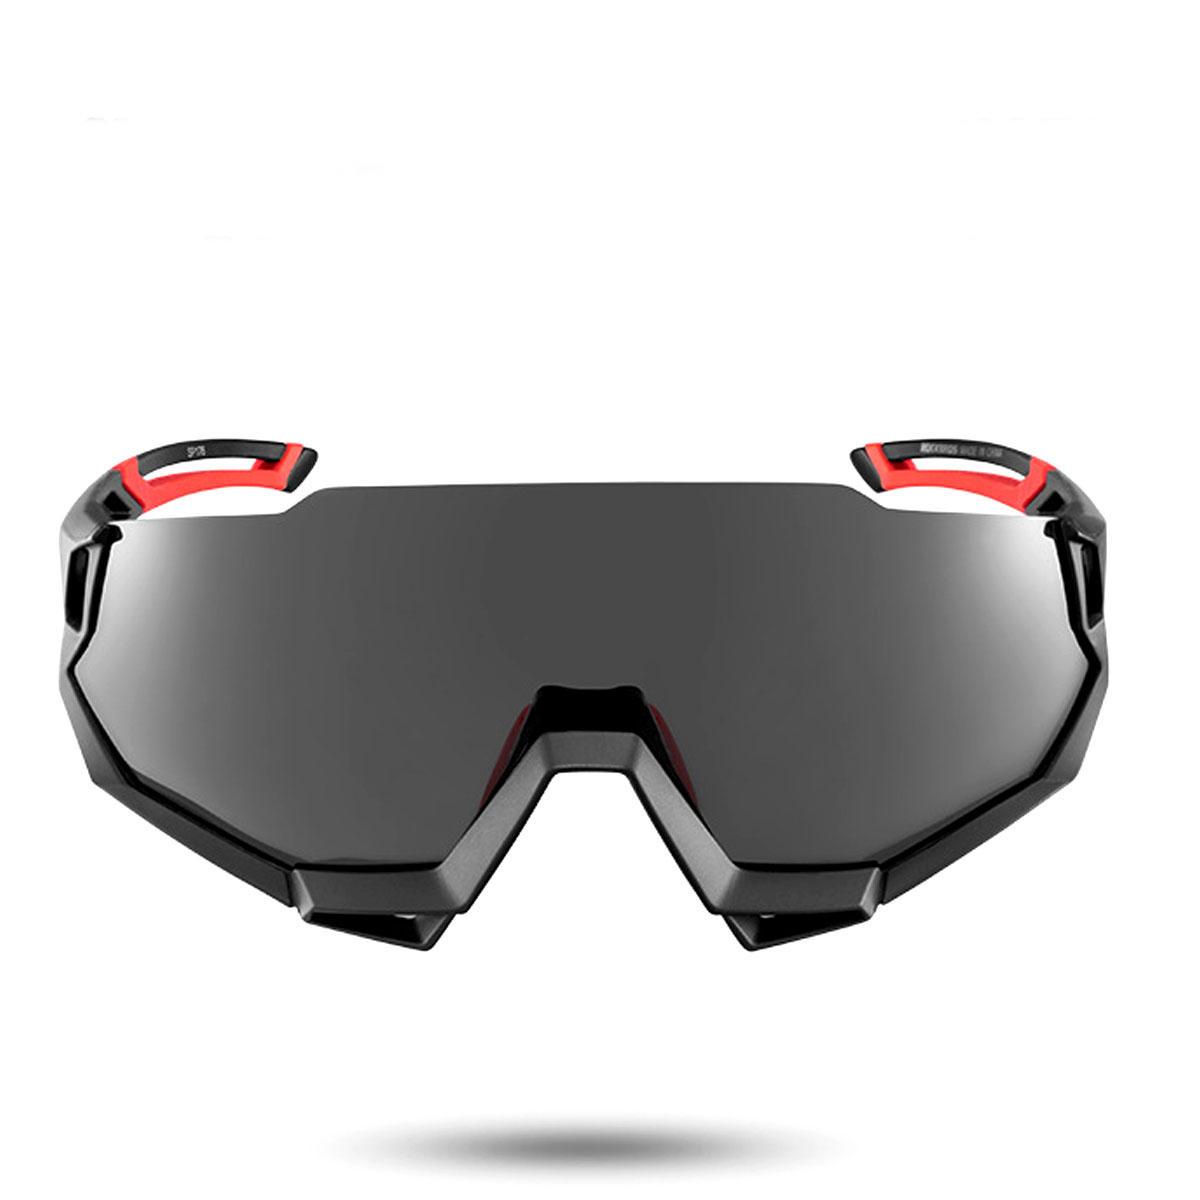 Black RockBros Polarized Cycling Glasses Half Frame Sports Sunglasses Goggles